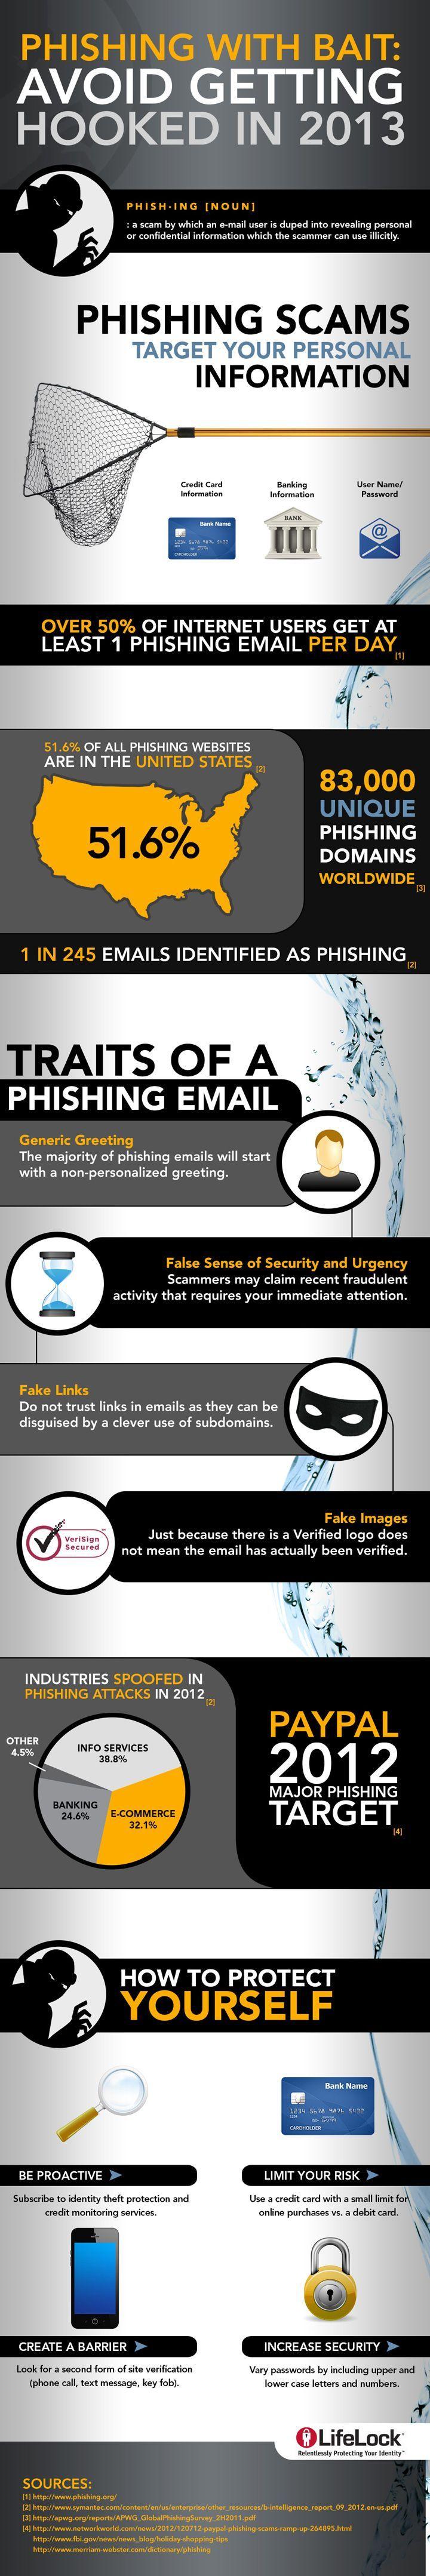 29 best Fraud & Scam Awareness images on Pinterest